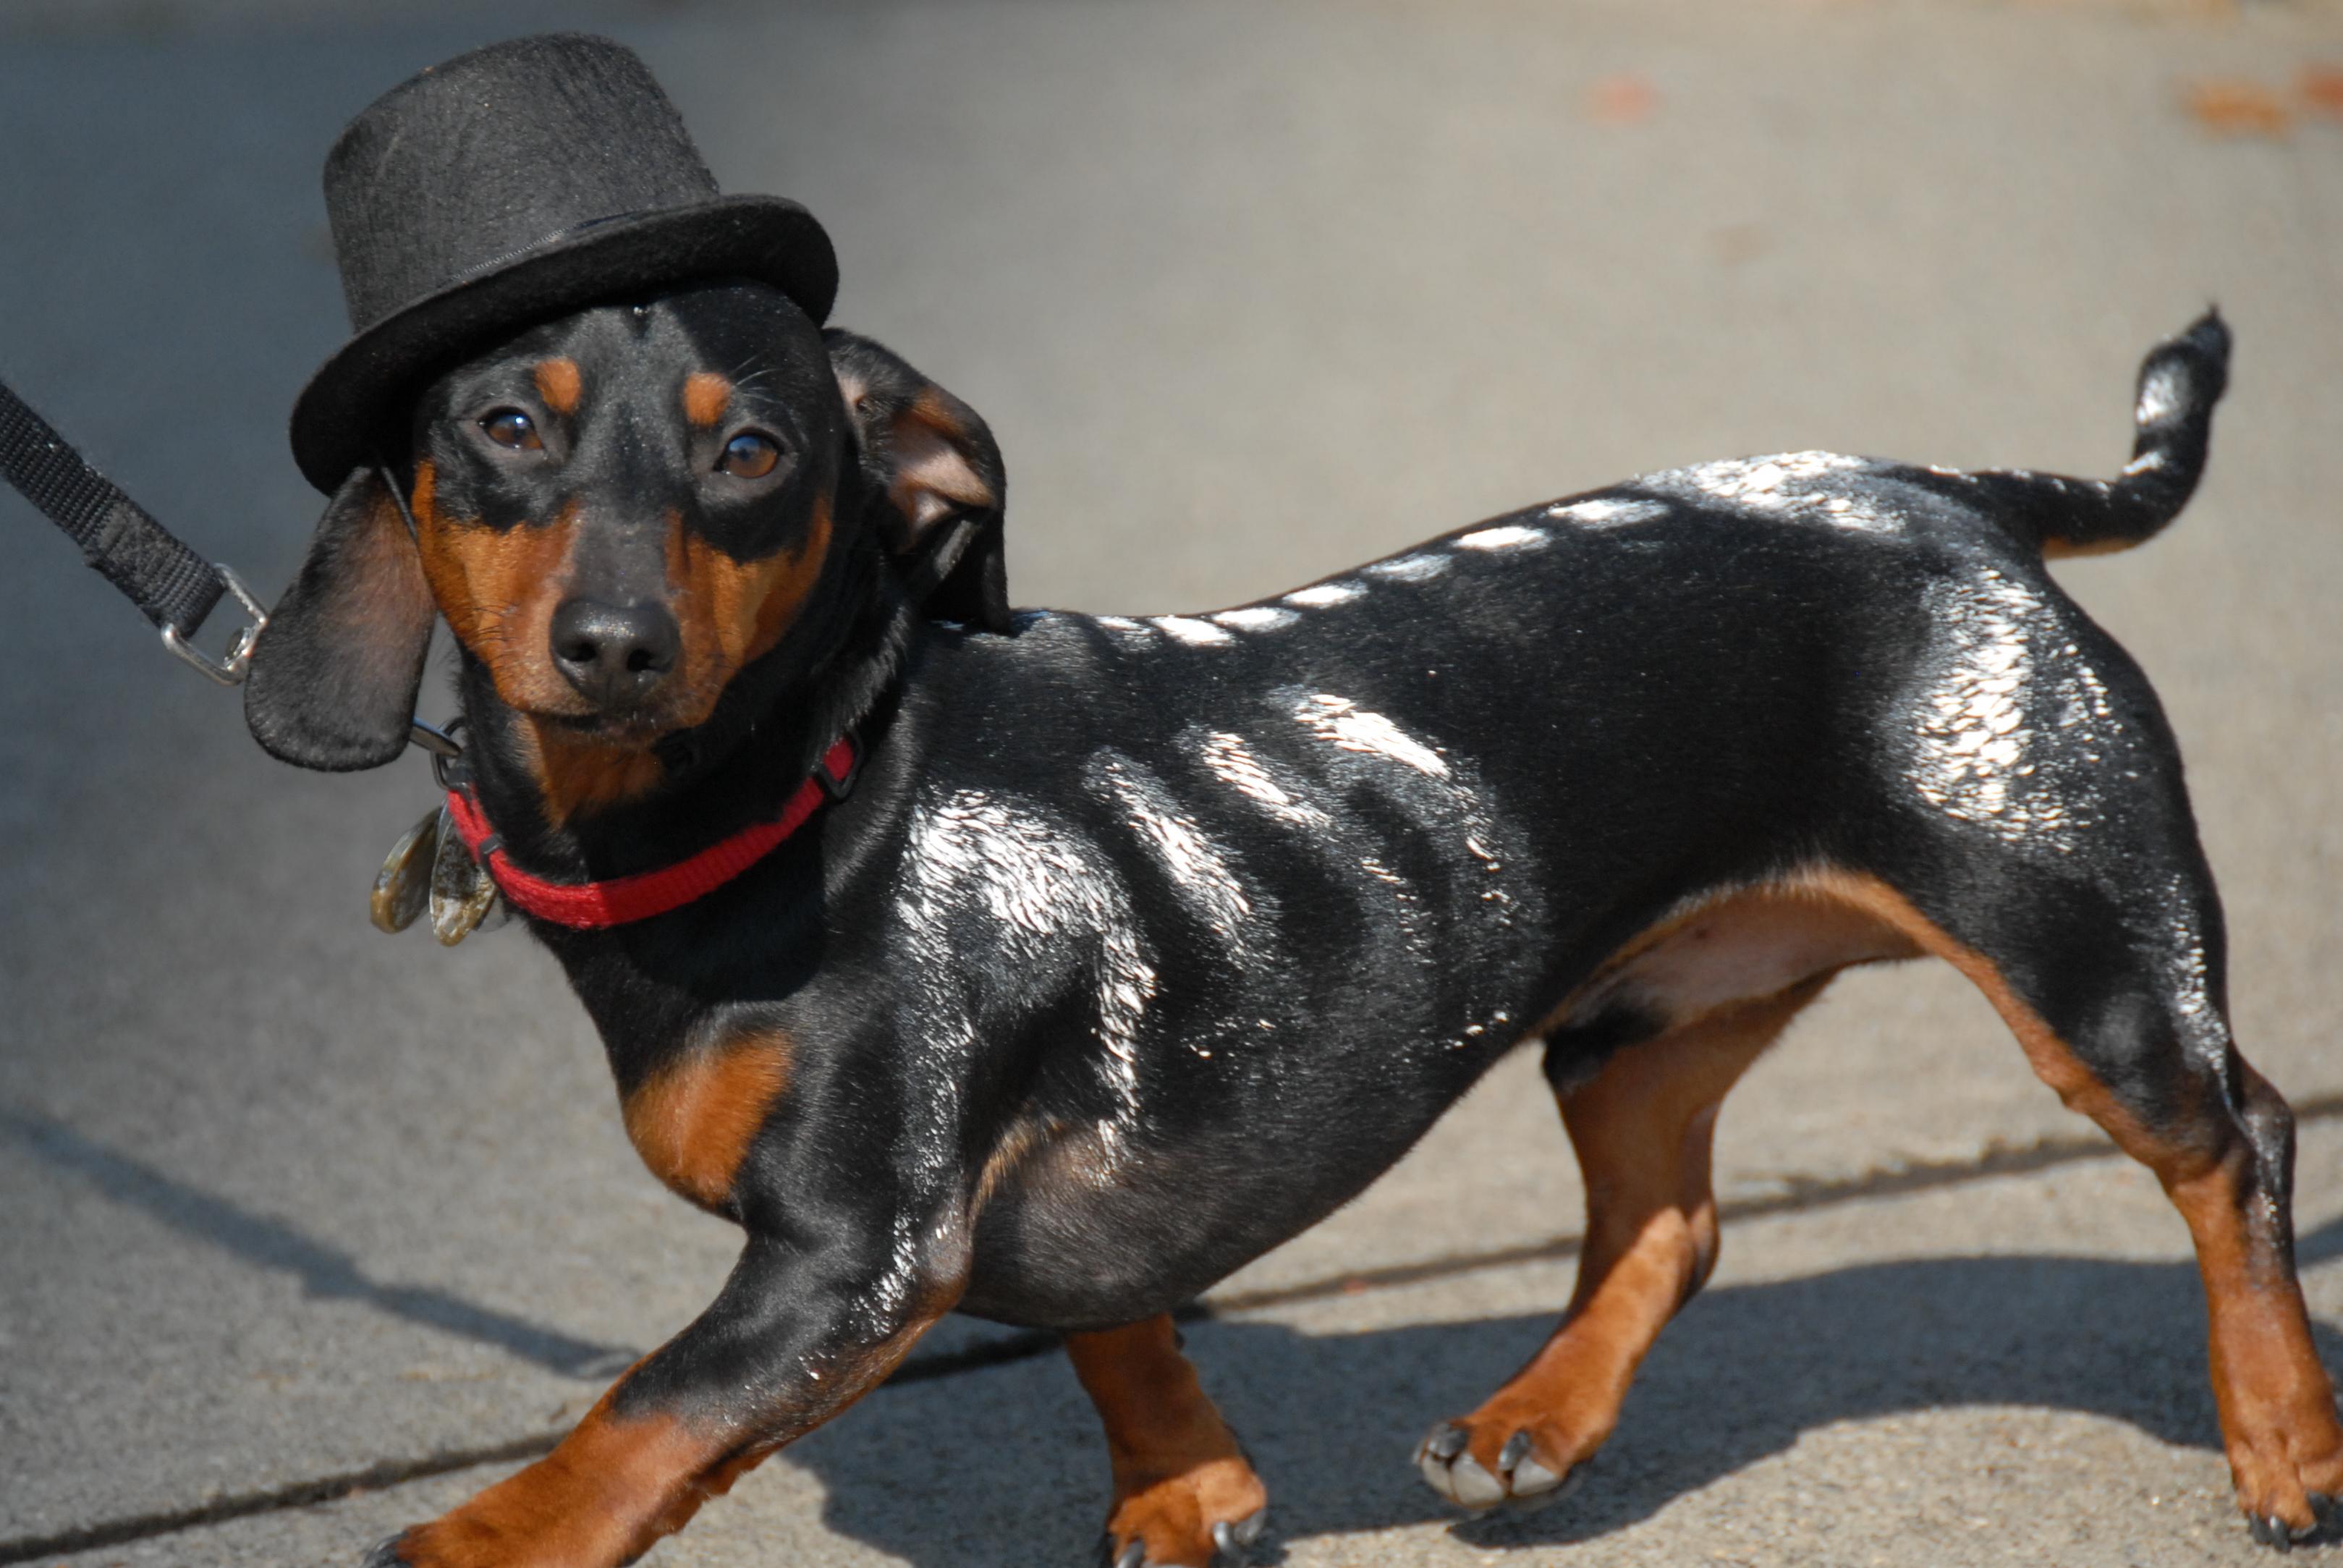 2010-10-24 – morristown dog halloween costume parade | morris county